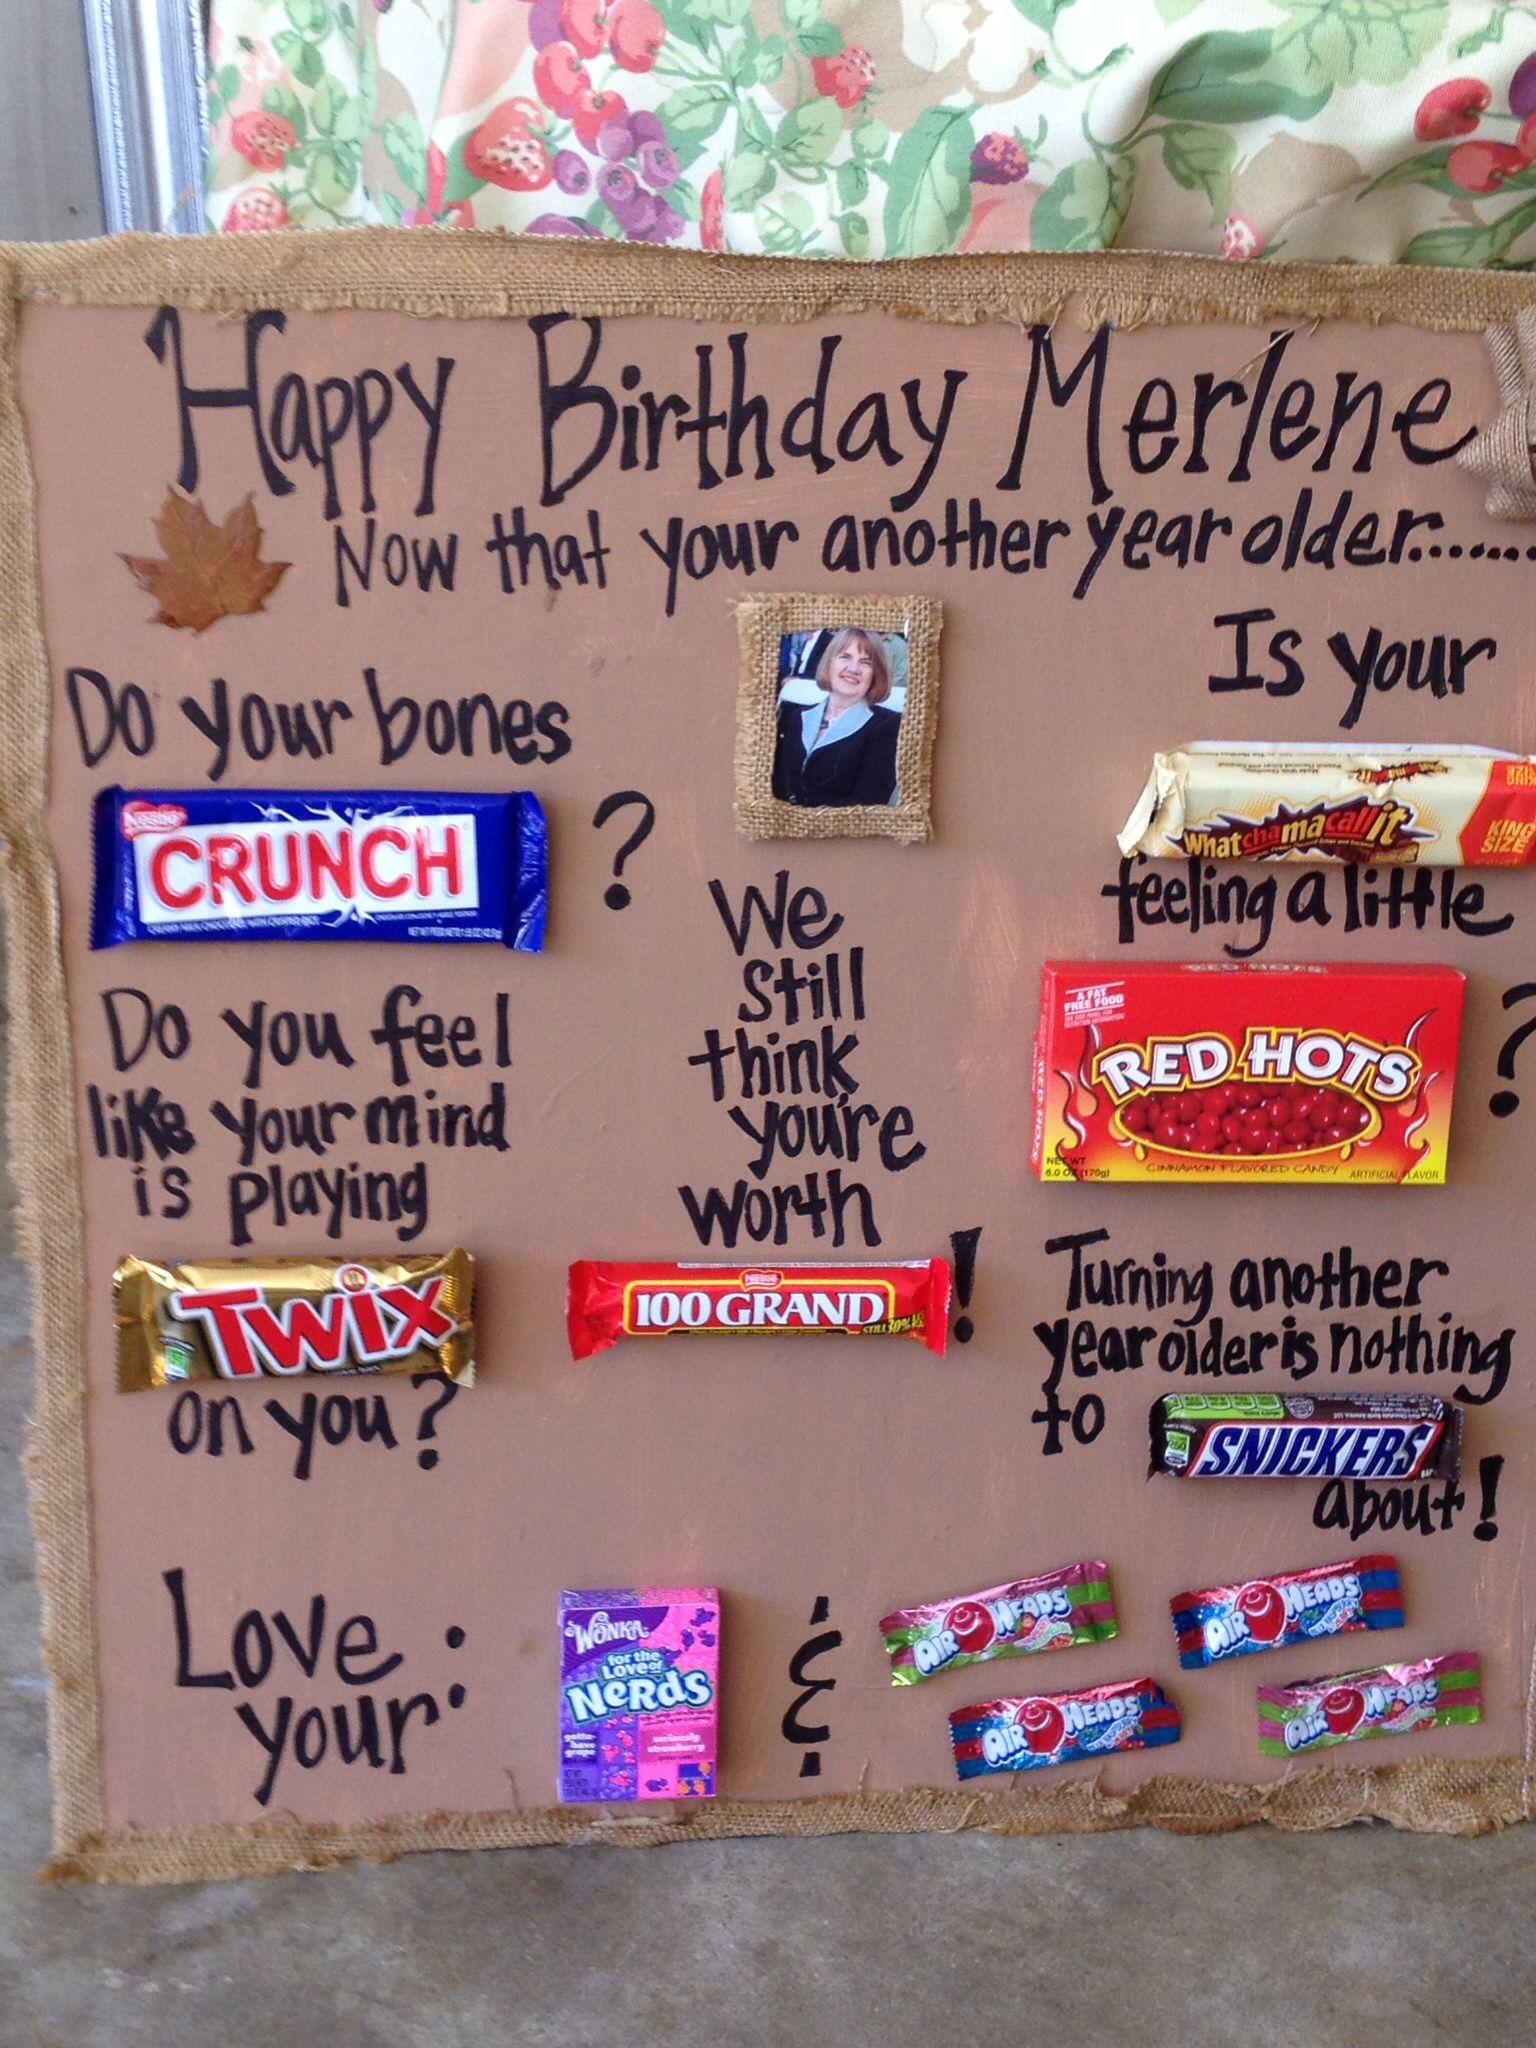 Candy Bar Birthday Poem : candy, birthday, Susan, Malovrh, Birthday, Ideas, Candy, Posters,, Cards,